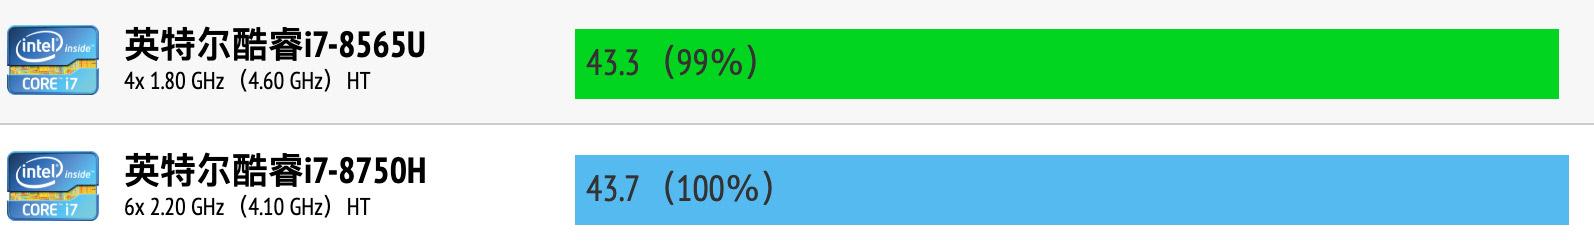 Intel Core i7-8565U和i7-8750H性能跑分对比评测